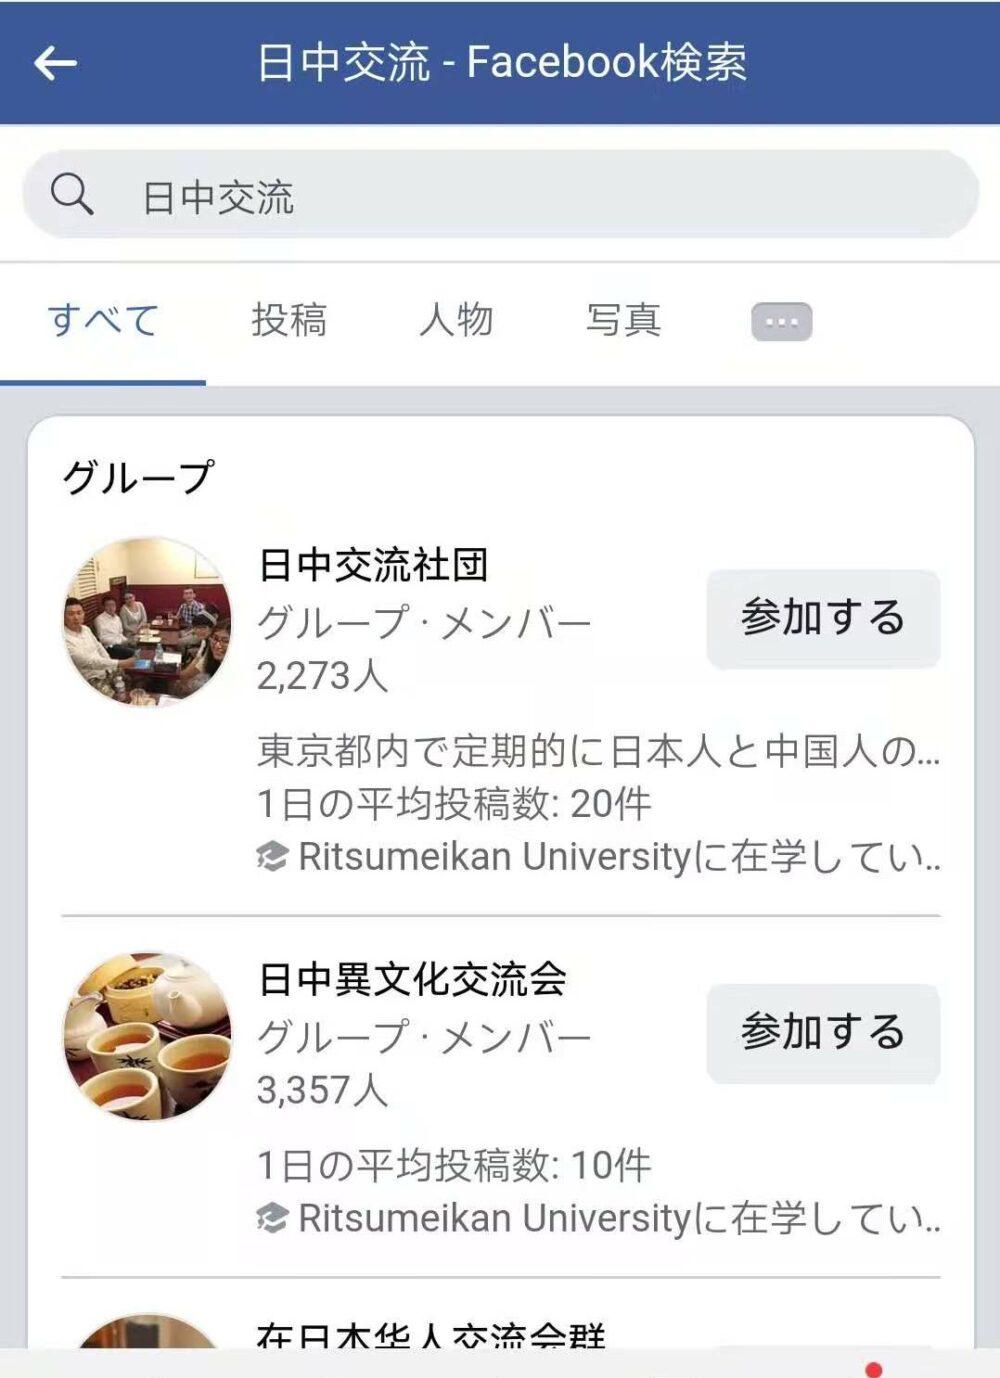 facebookで見つけた日中交流会の写真